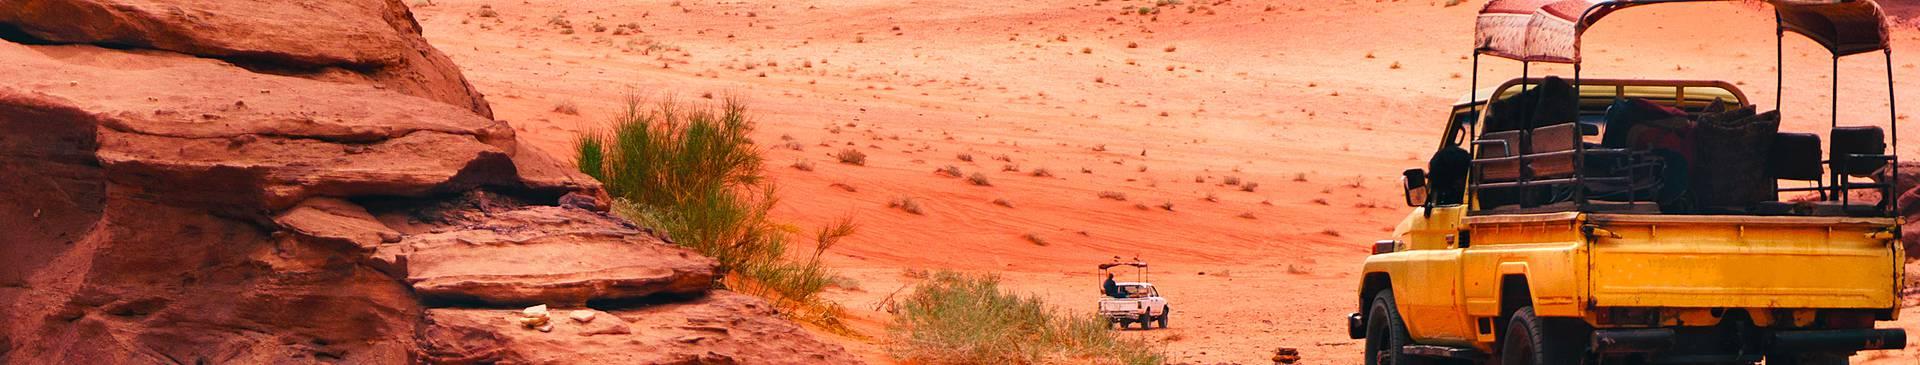 Rutas en coche por Jordania